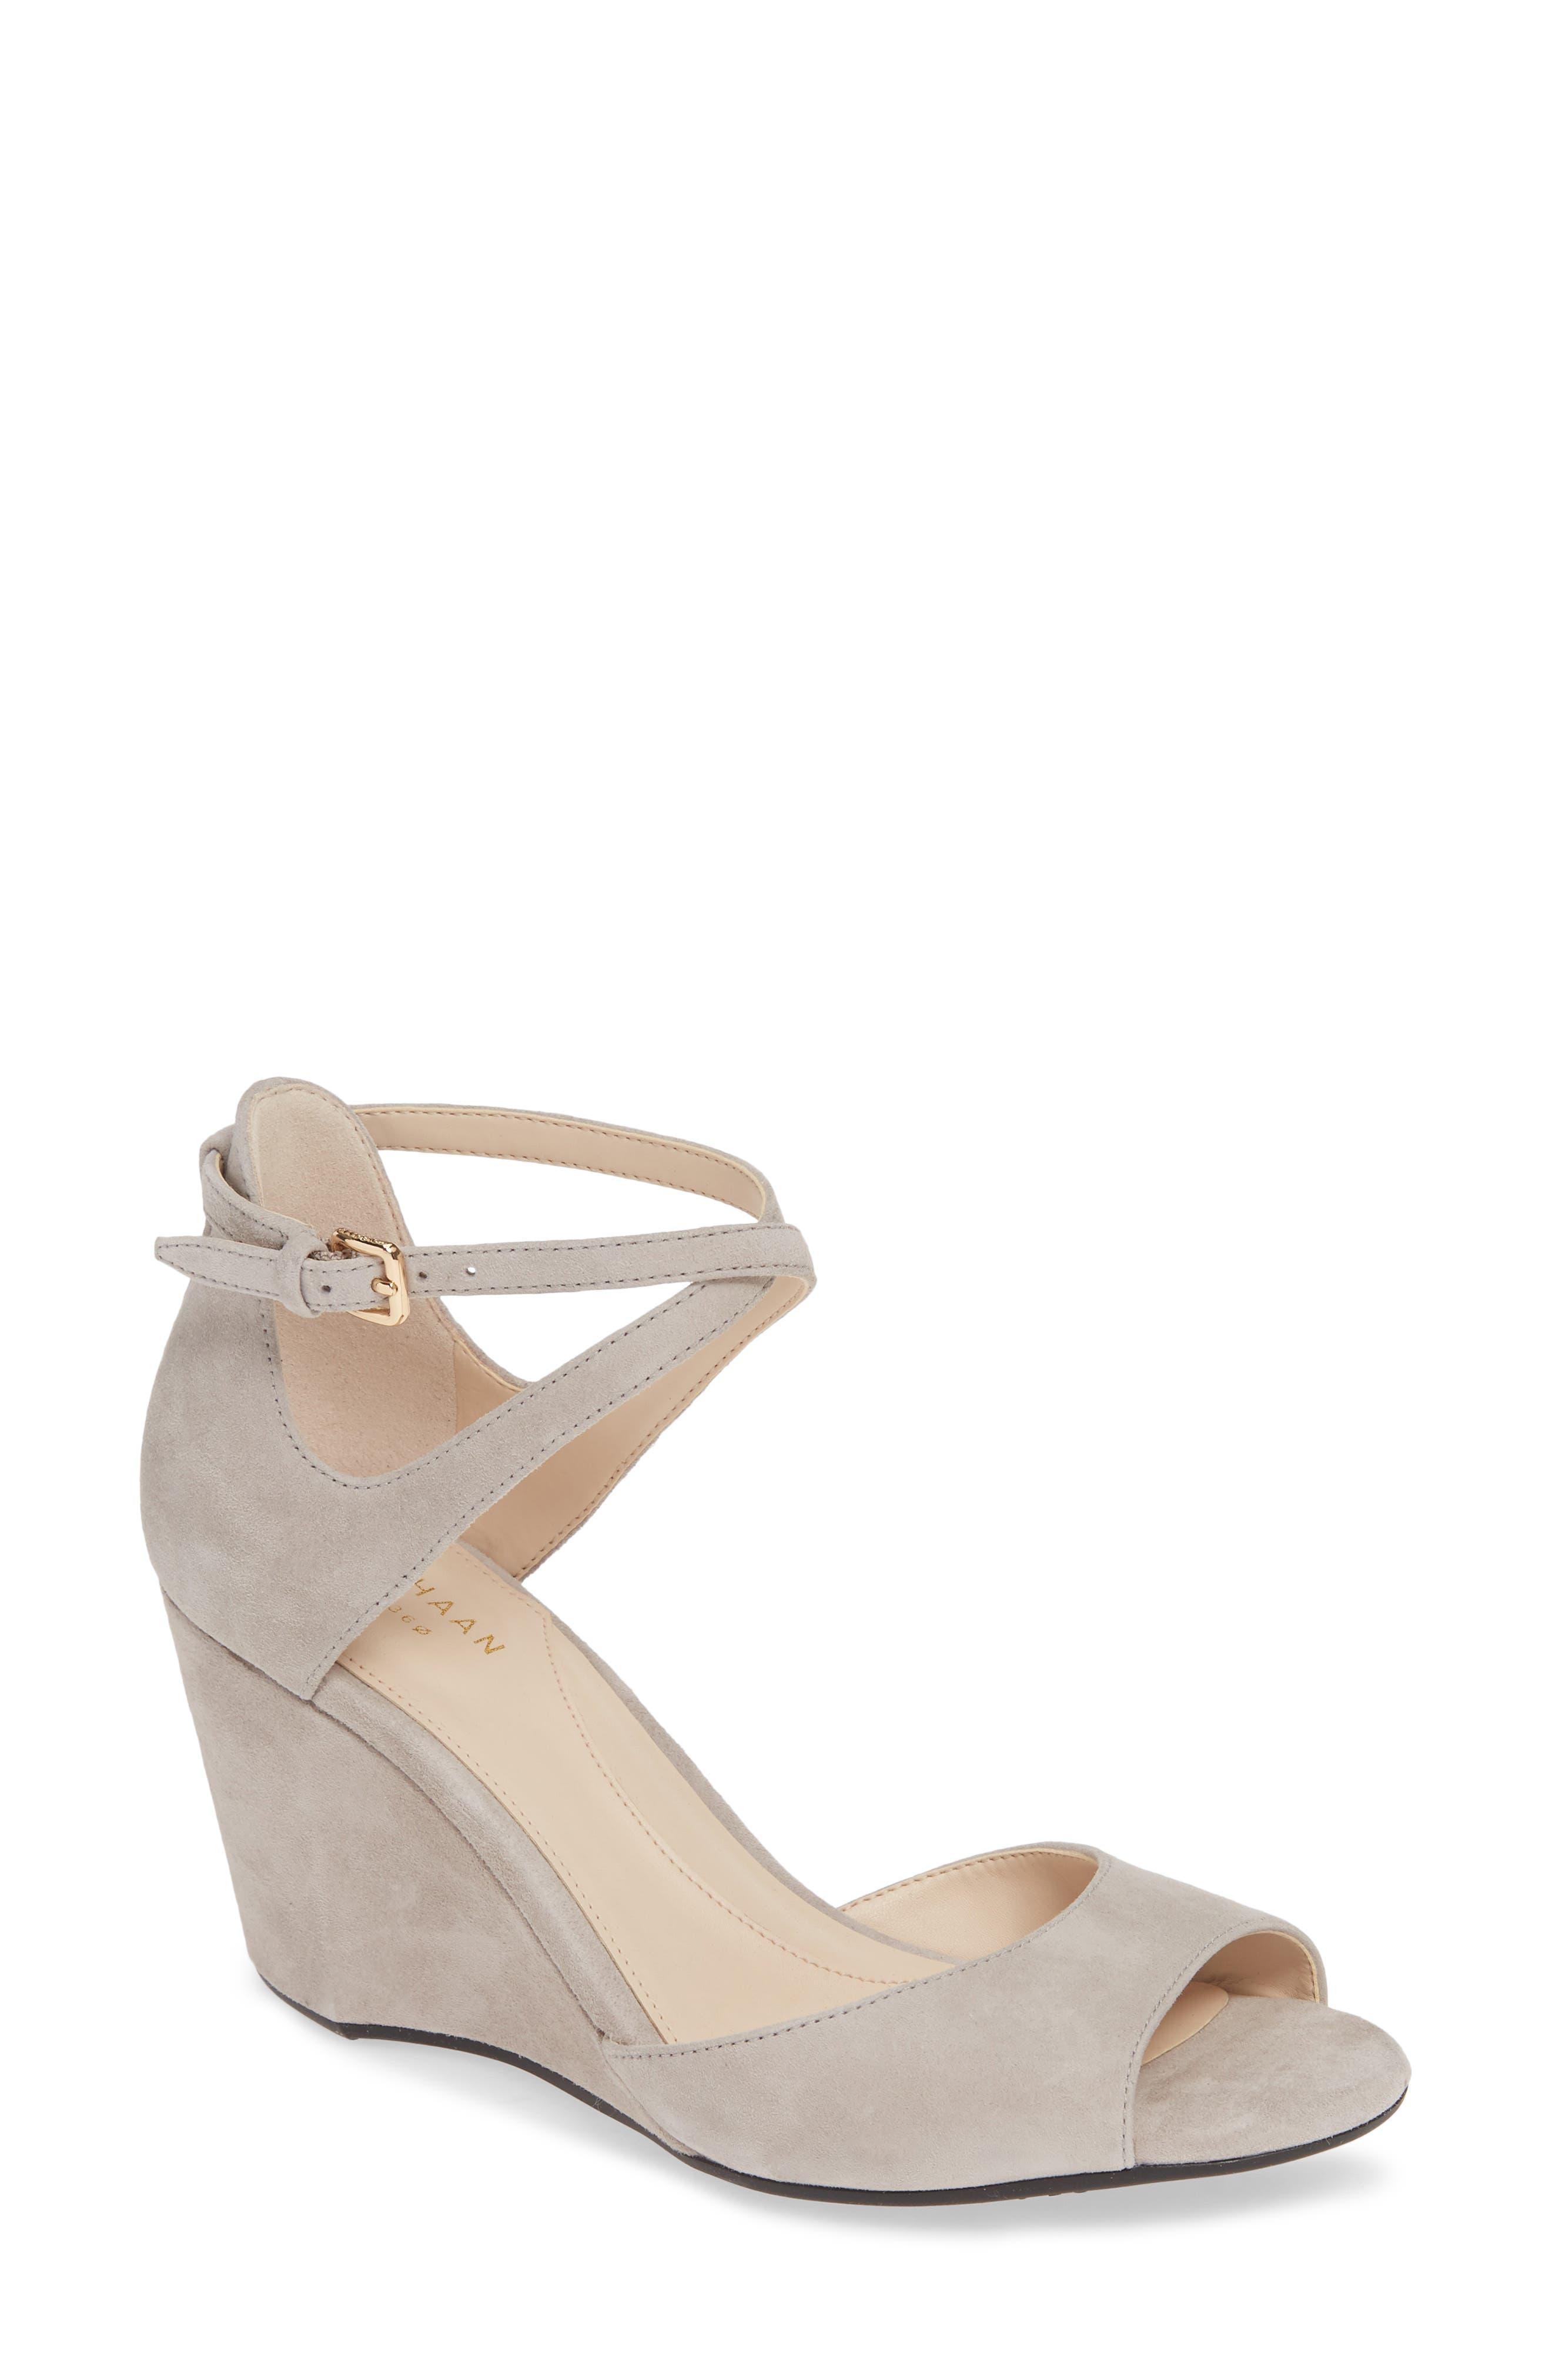 Cole Haan Sadie Open Toe Wedge Sandal (Women)